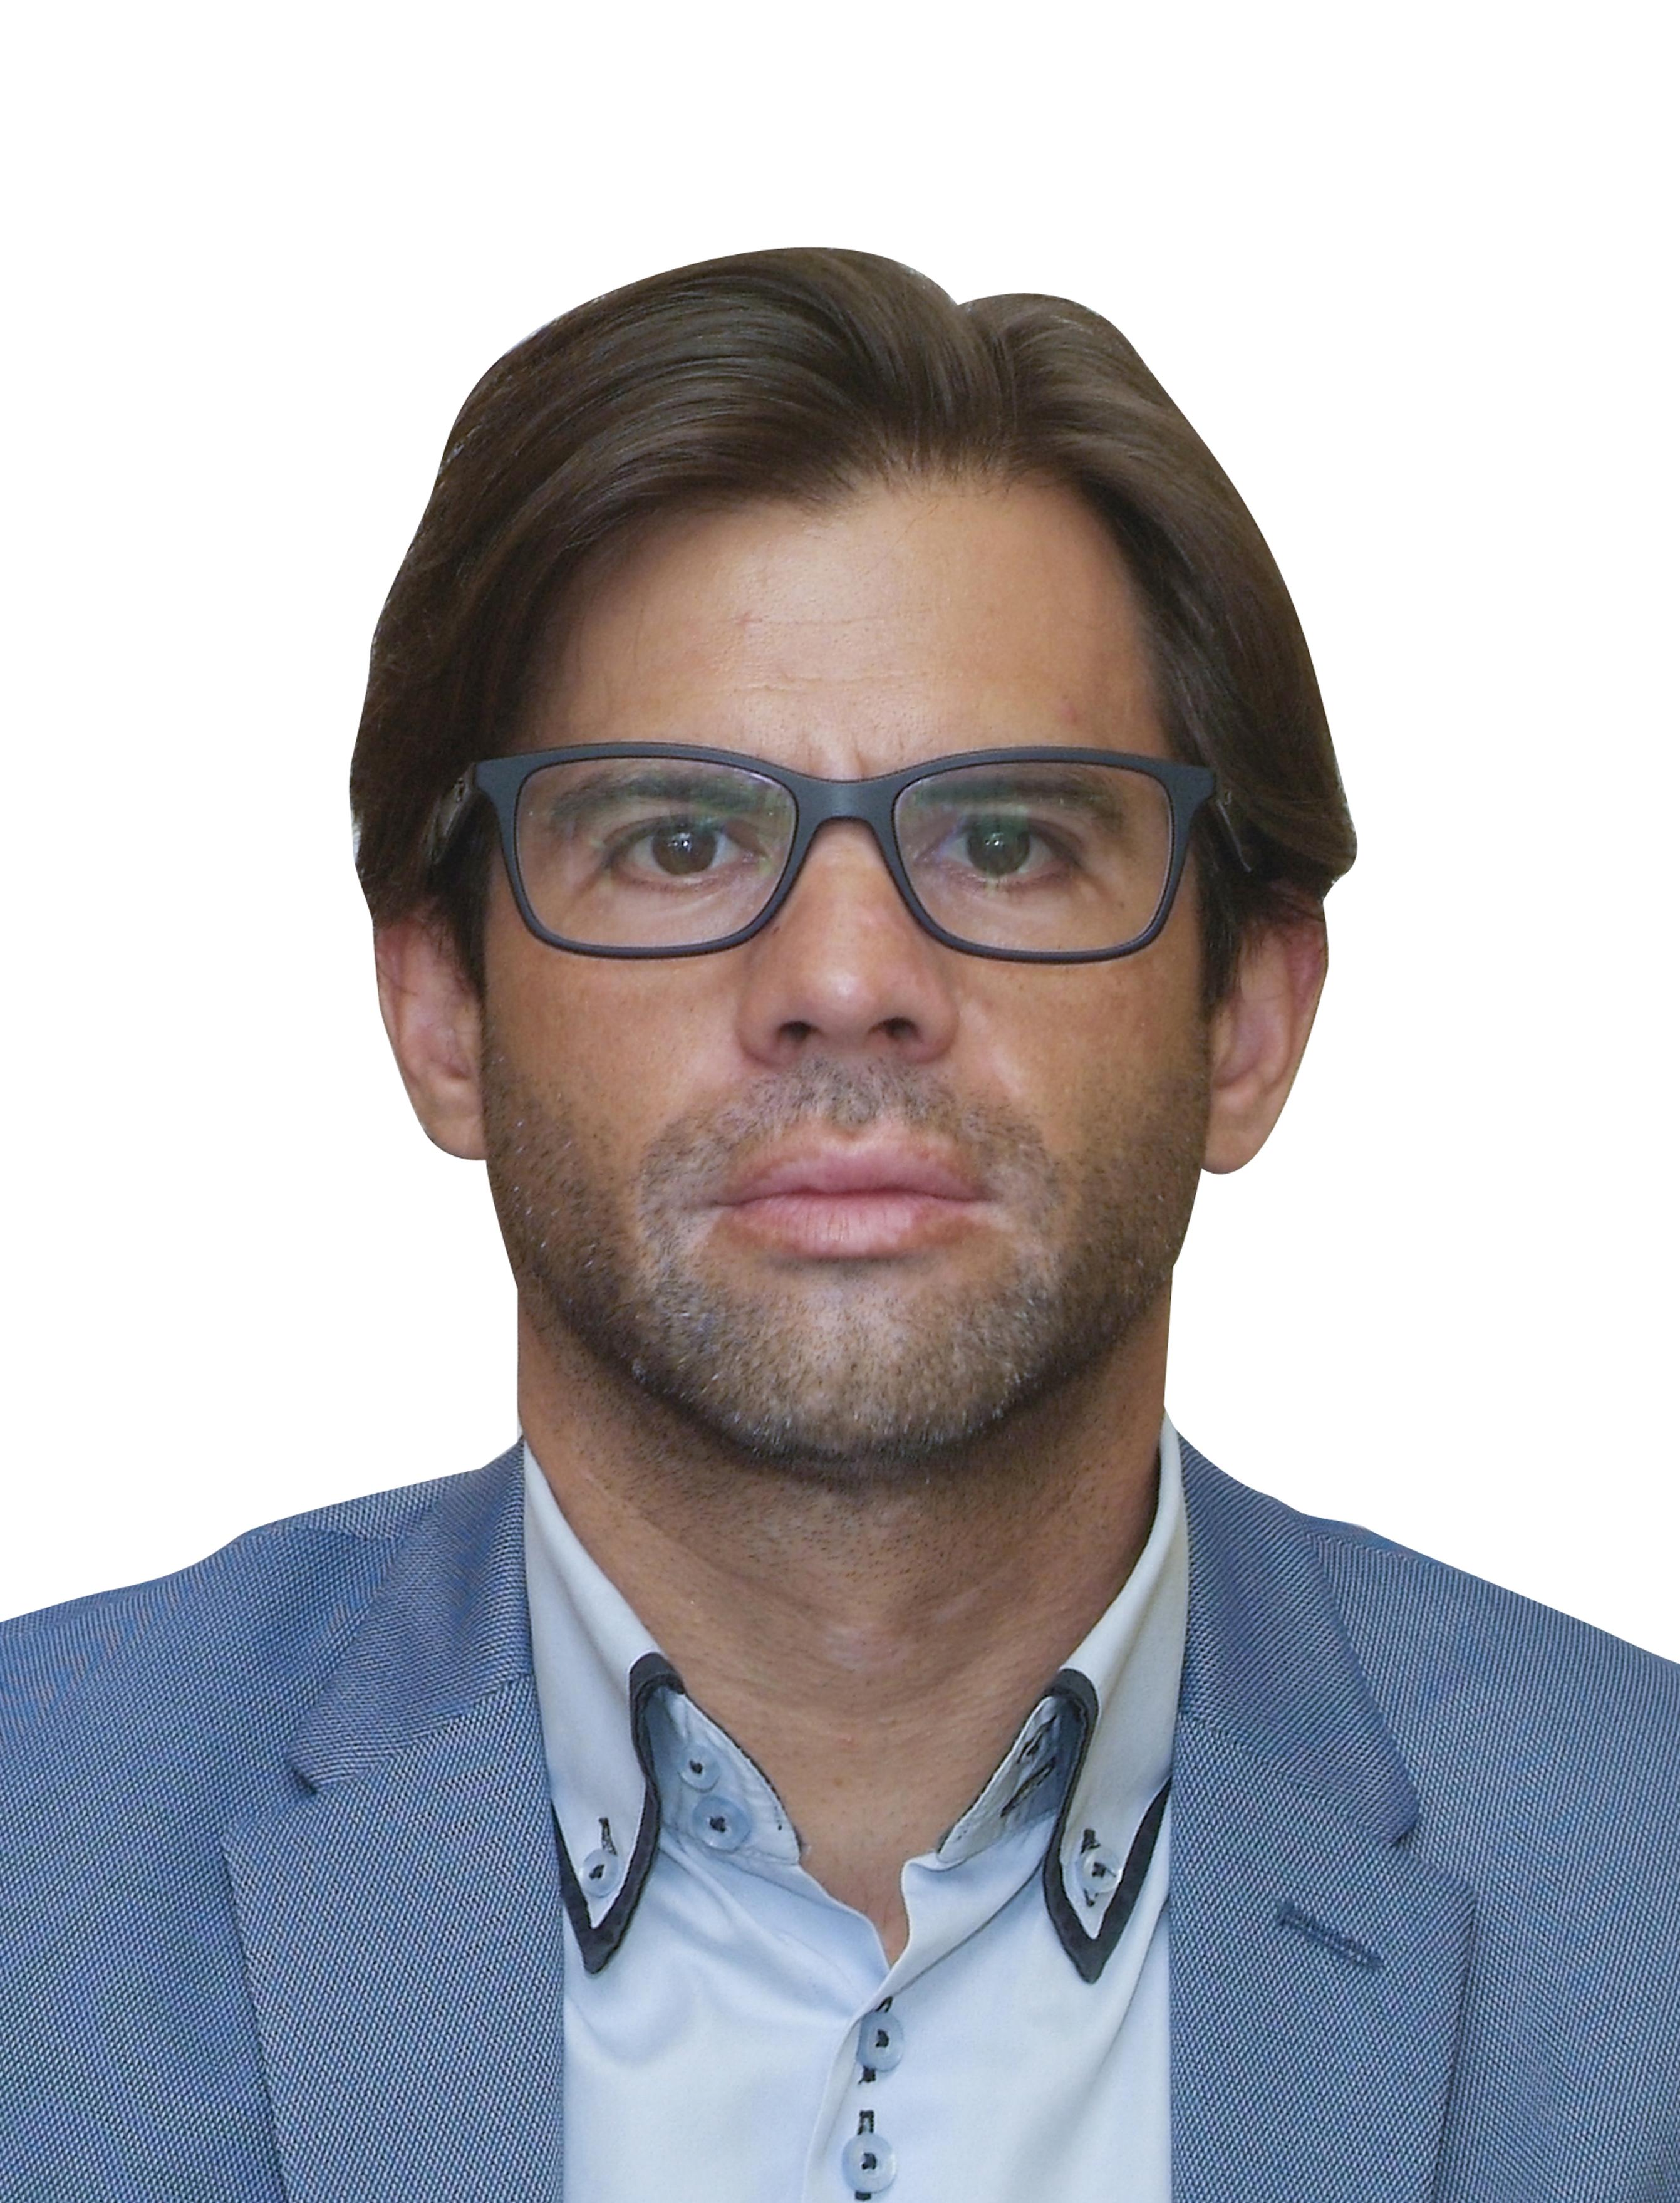 4.3.5 BrunoNovo-Solicitador